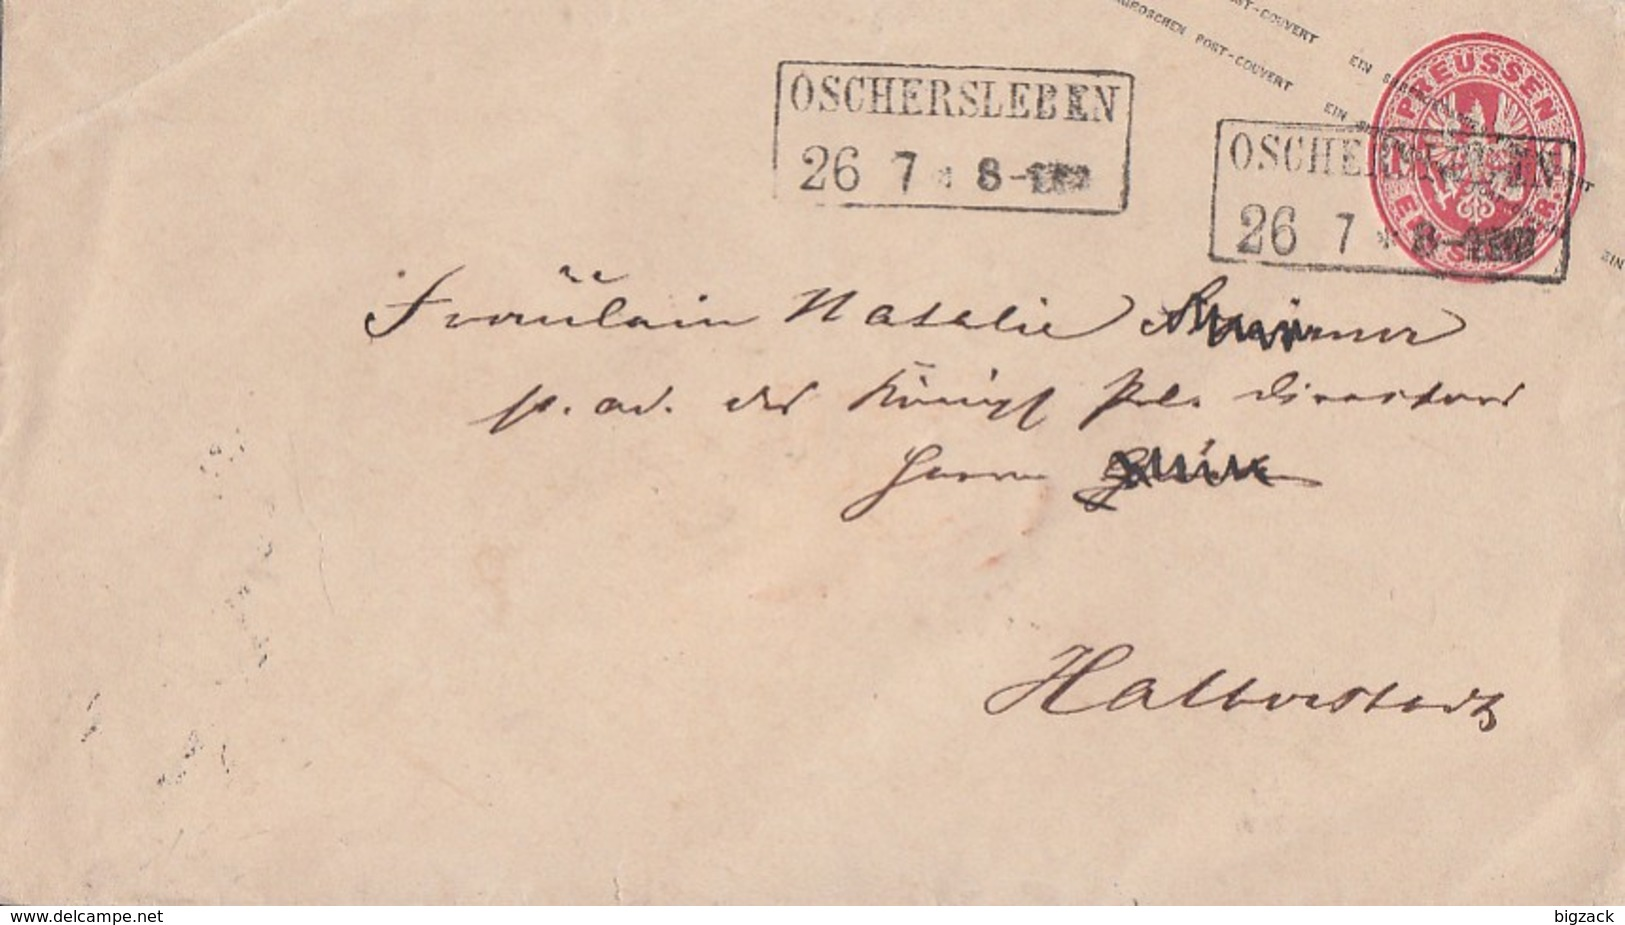 Preussen GS-Umschlag 1 Silbergr. R2 Oschersleben 26.7. - Preussen